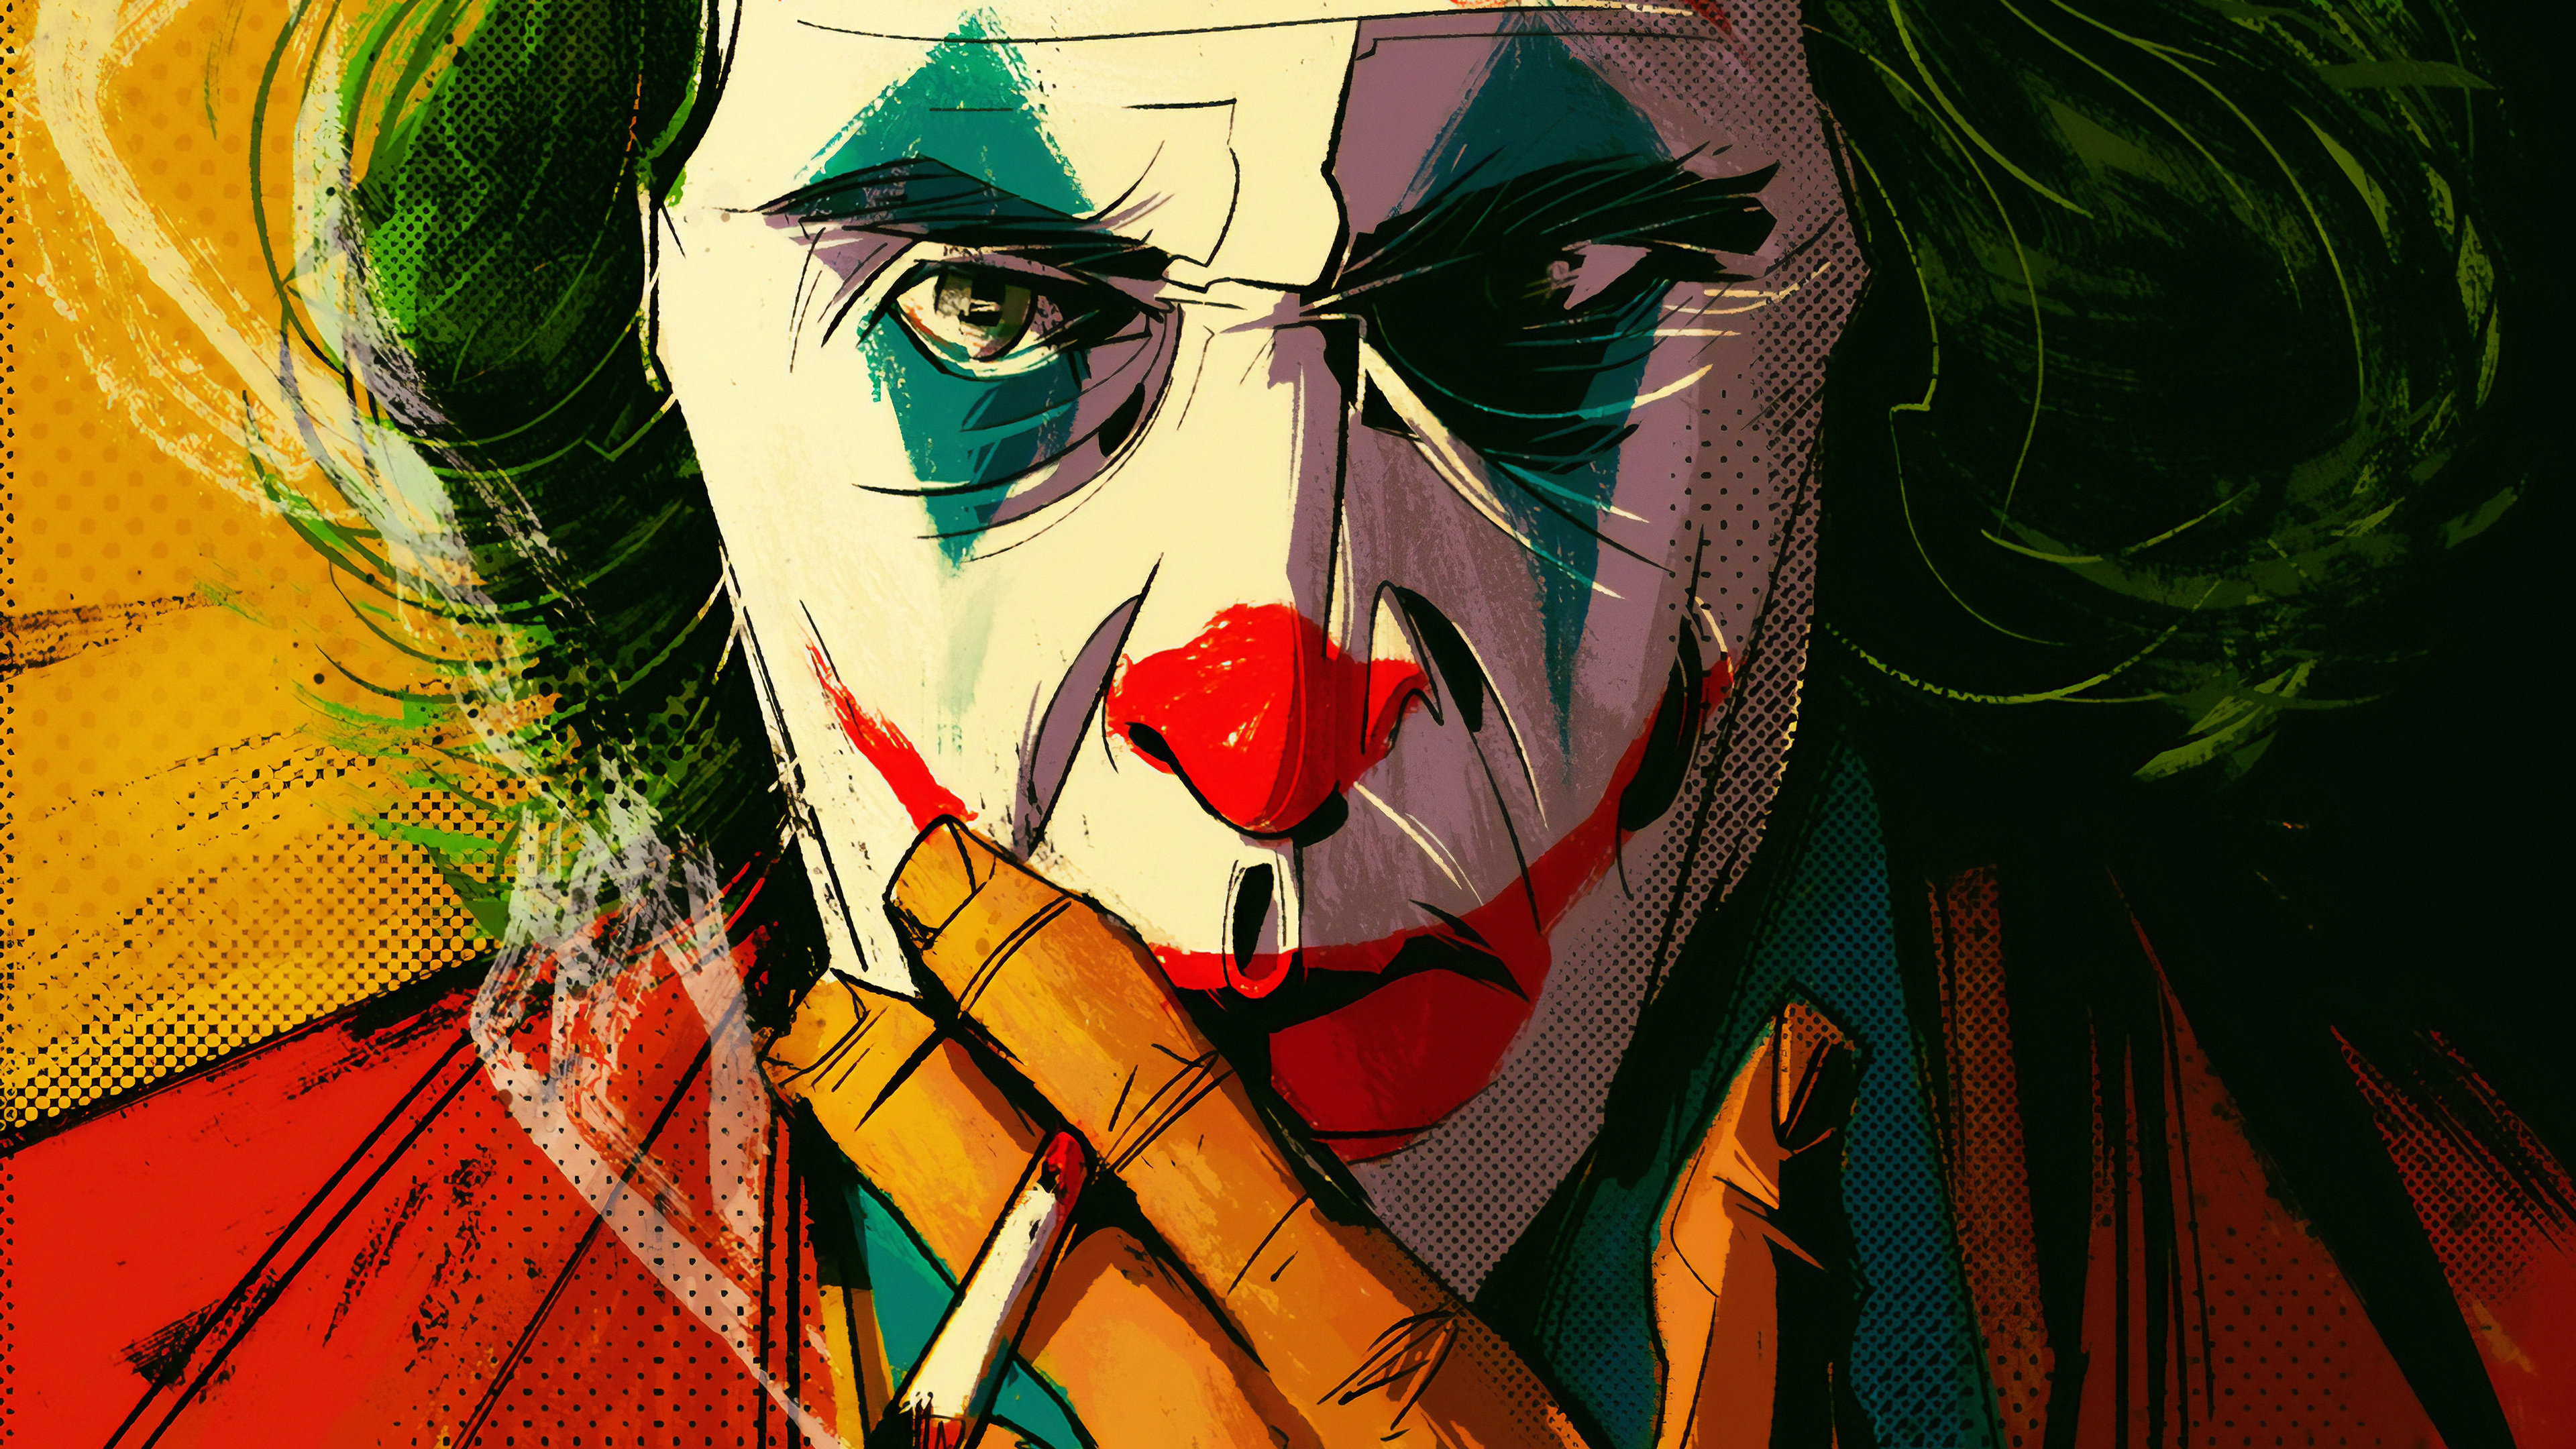 joker cigratte new 1572368690 - Joker Cigratte New - supervillain wallpapers, superheroes wallpapers, joker wallpapers, joker movie wallpapers, hd-wallpapers, 4k-wallpapers